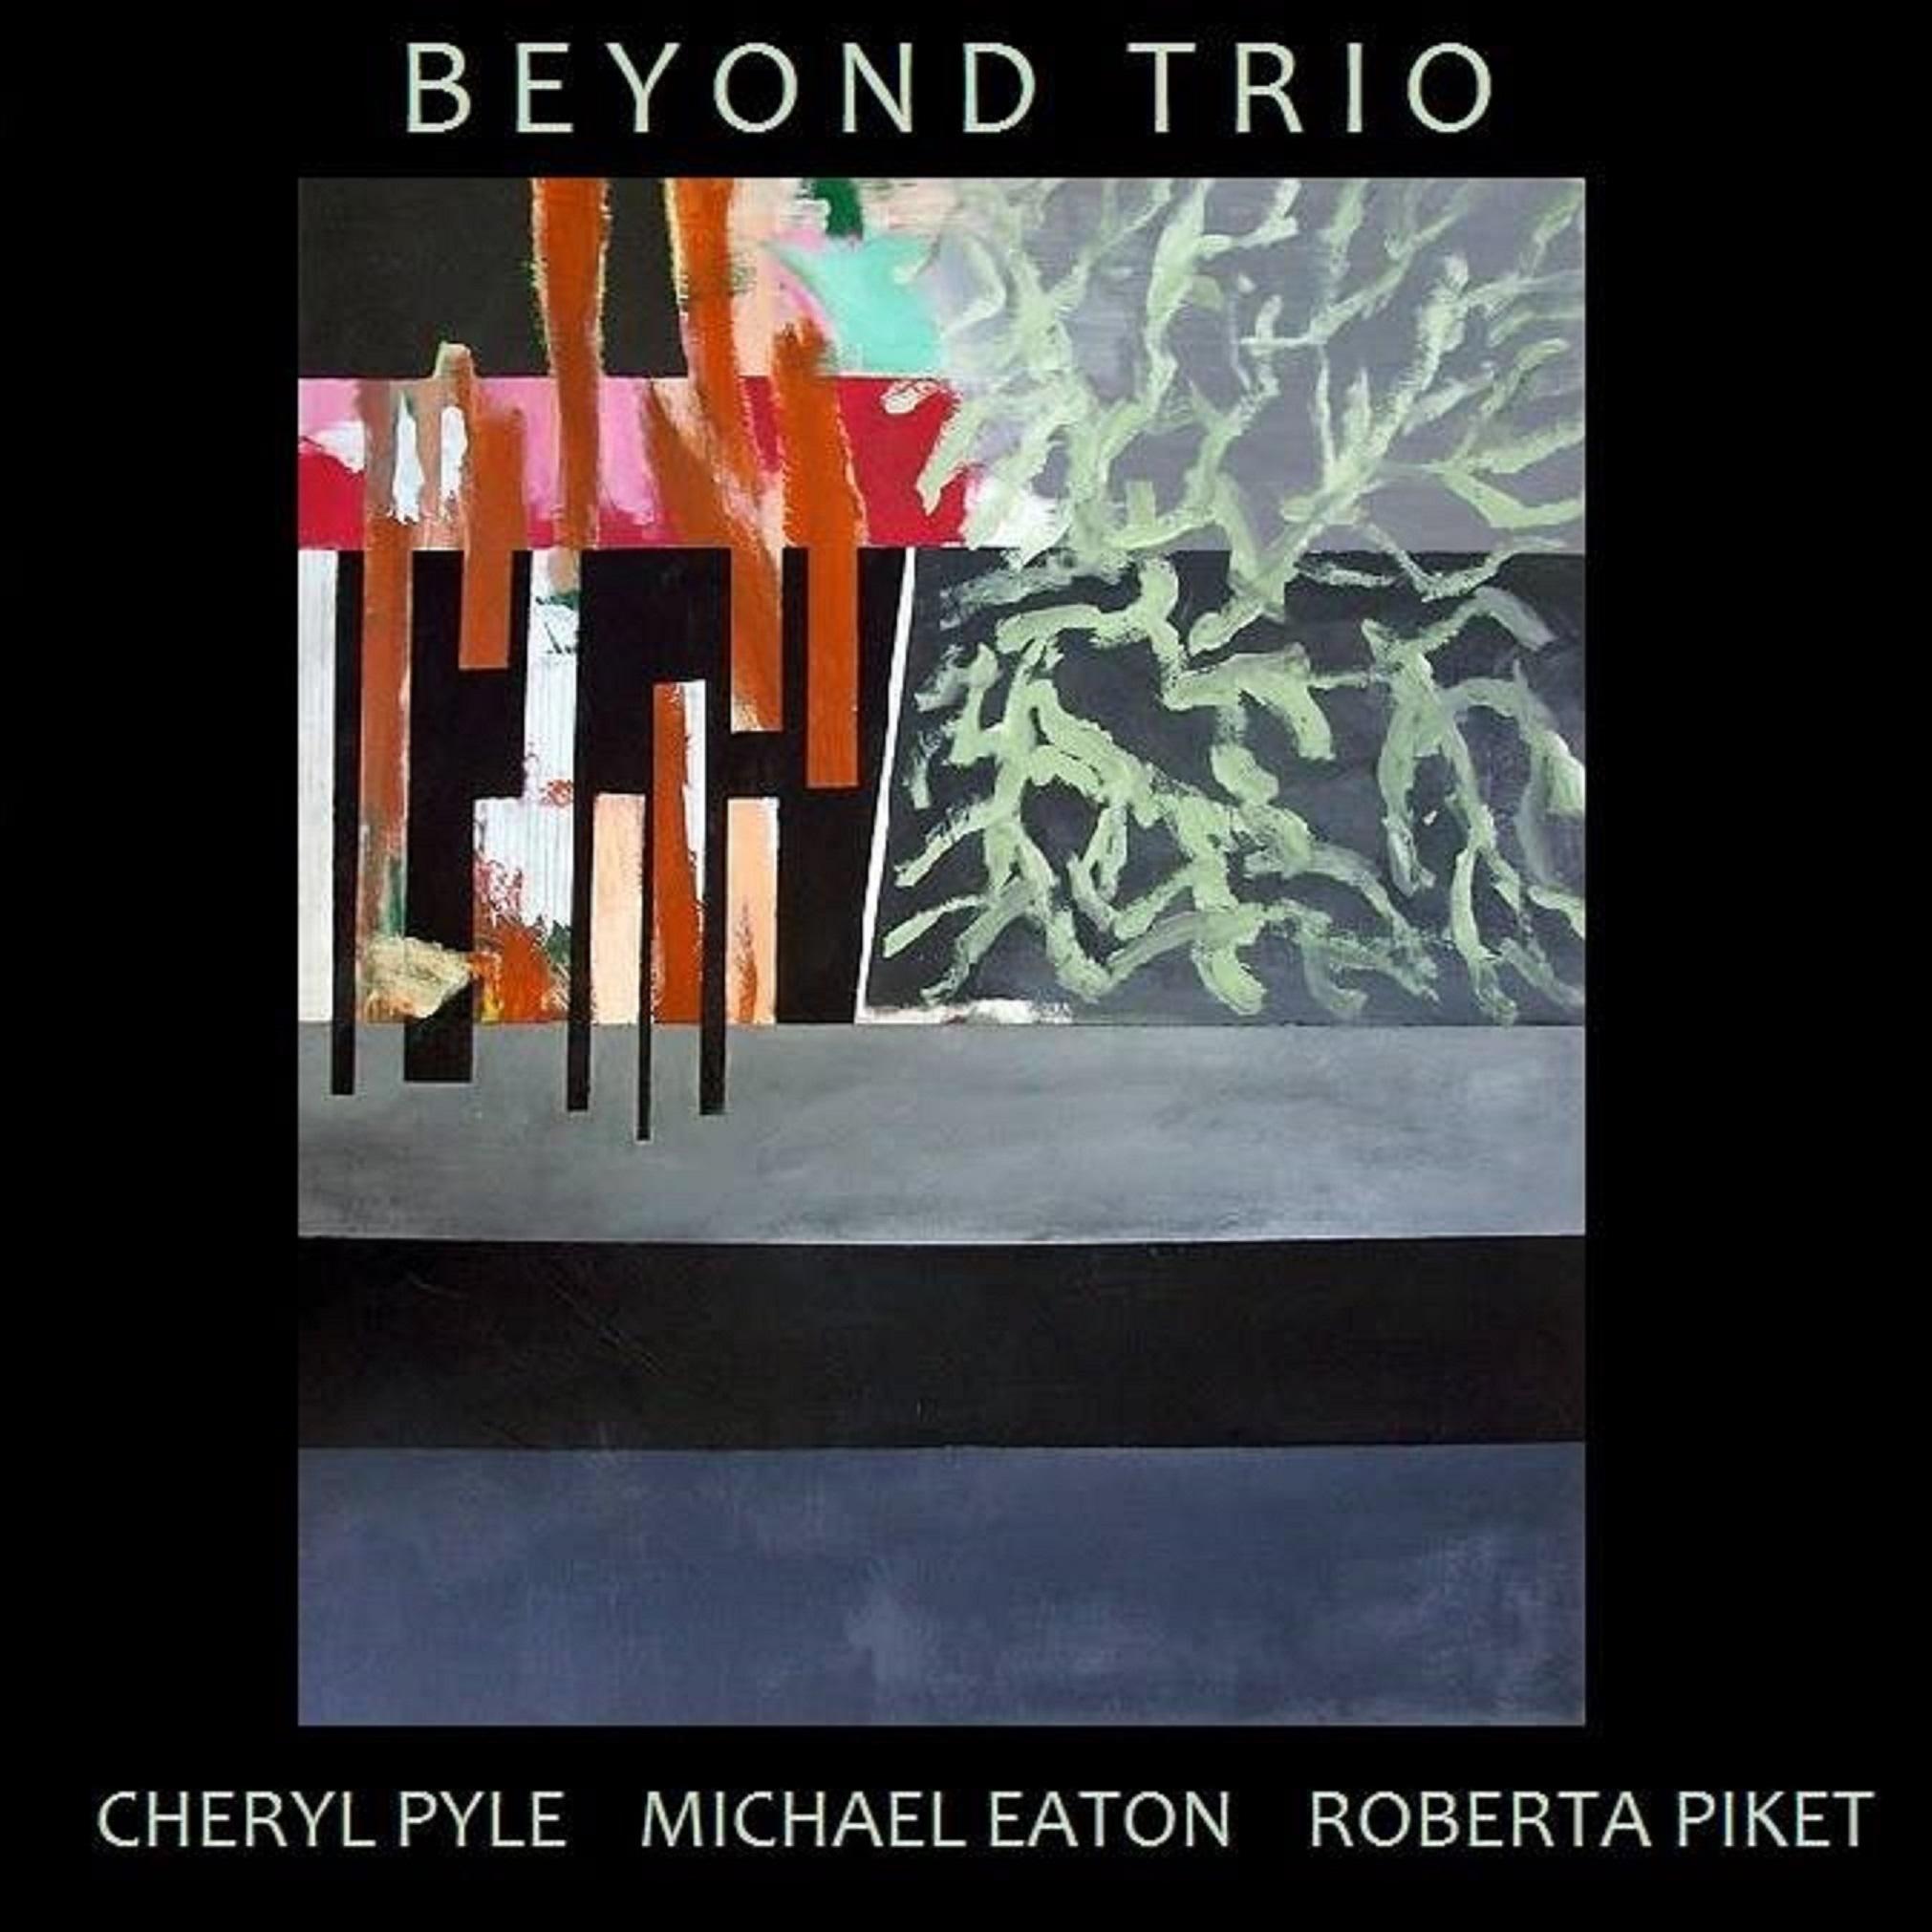 Beyond Trio Live at I beam